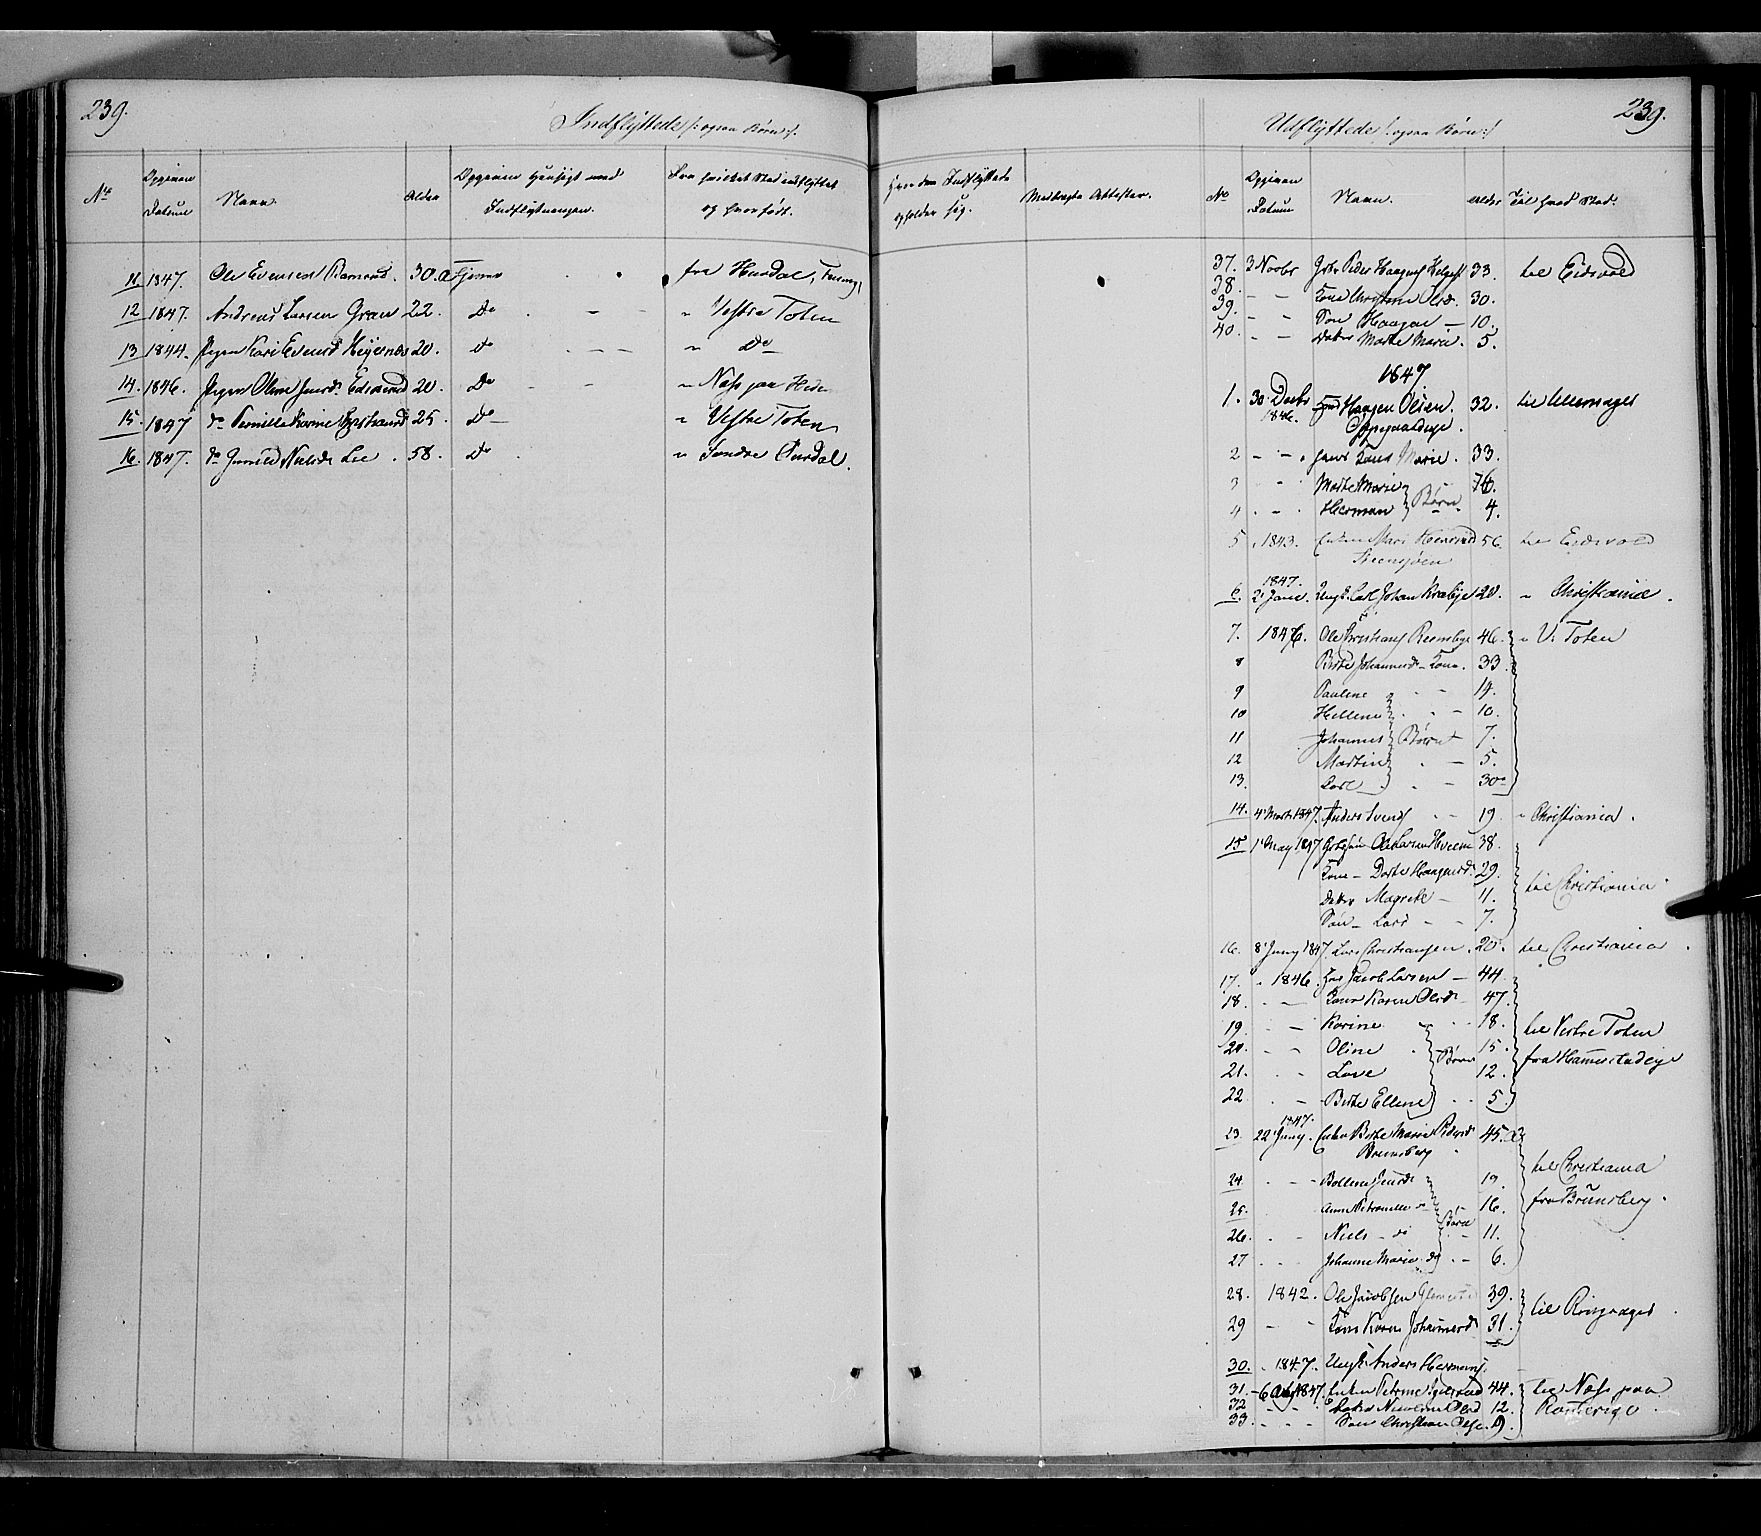 SAH, Østre Toten prestekontor, Ministerialbok nr. 2, 1840-1847, s. 239